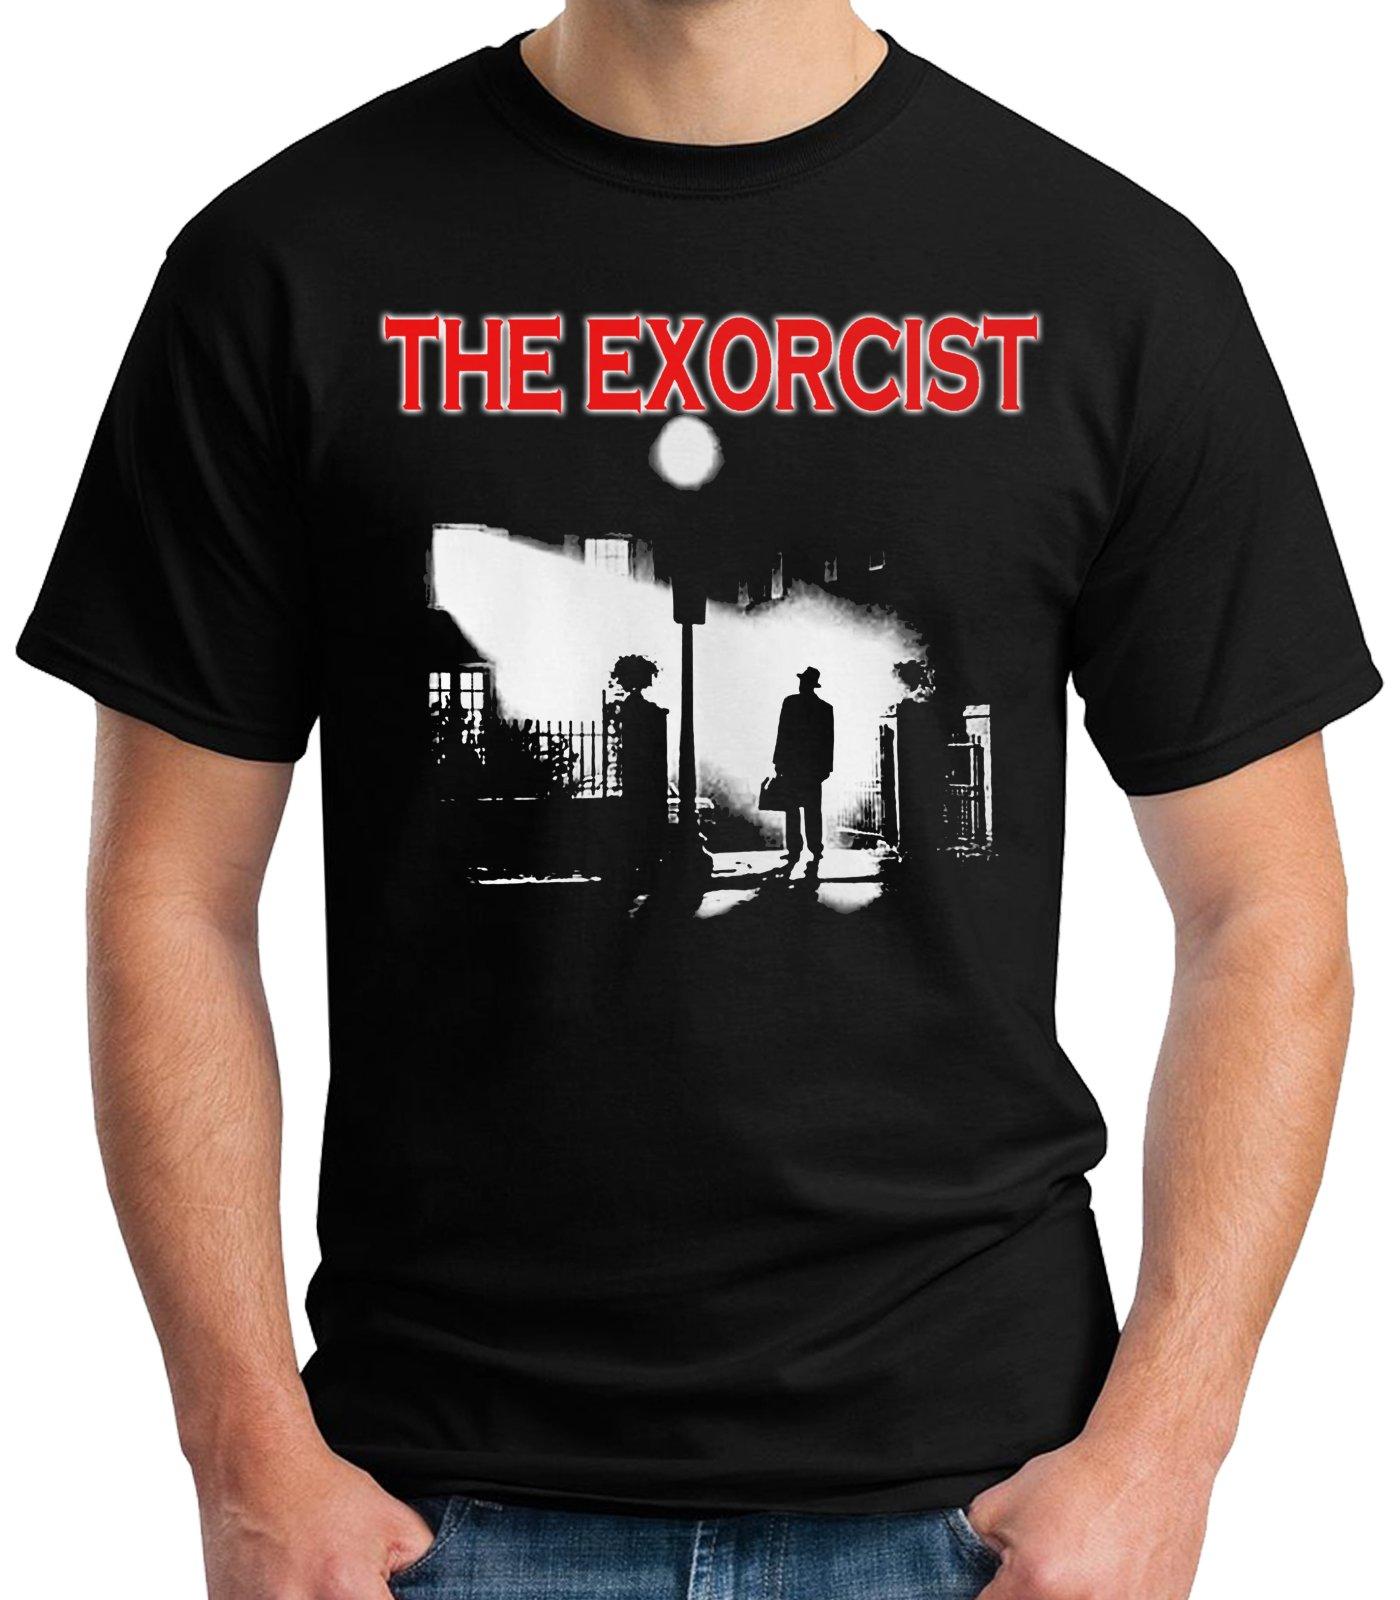 35mm - Camiseta Hombre - The Exorcist - El Exorcista - T-Shirt 3